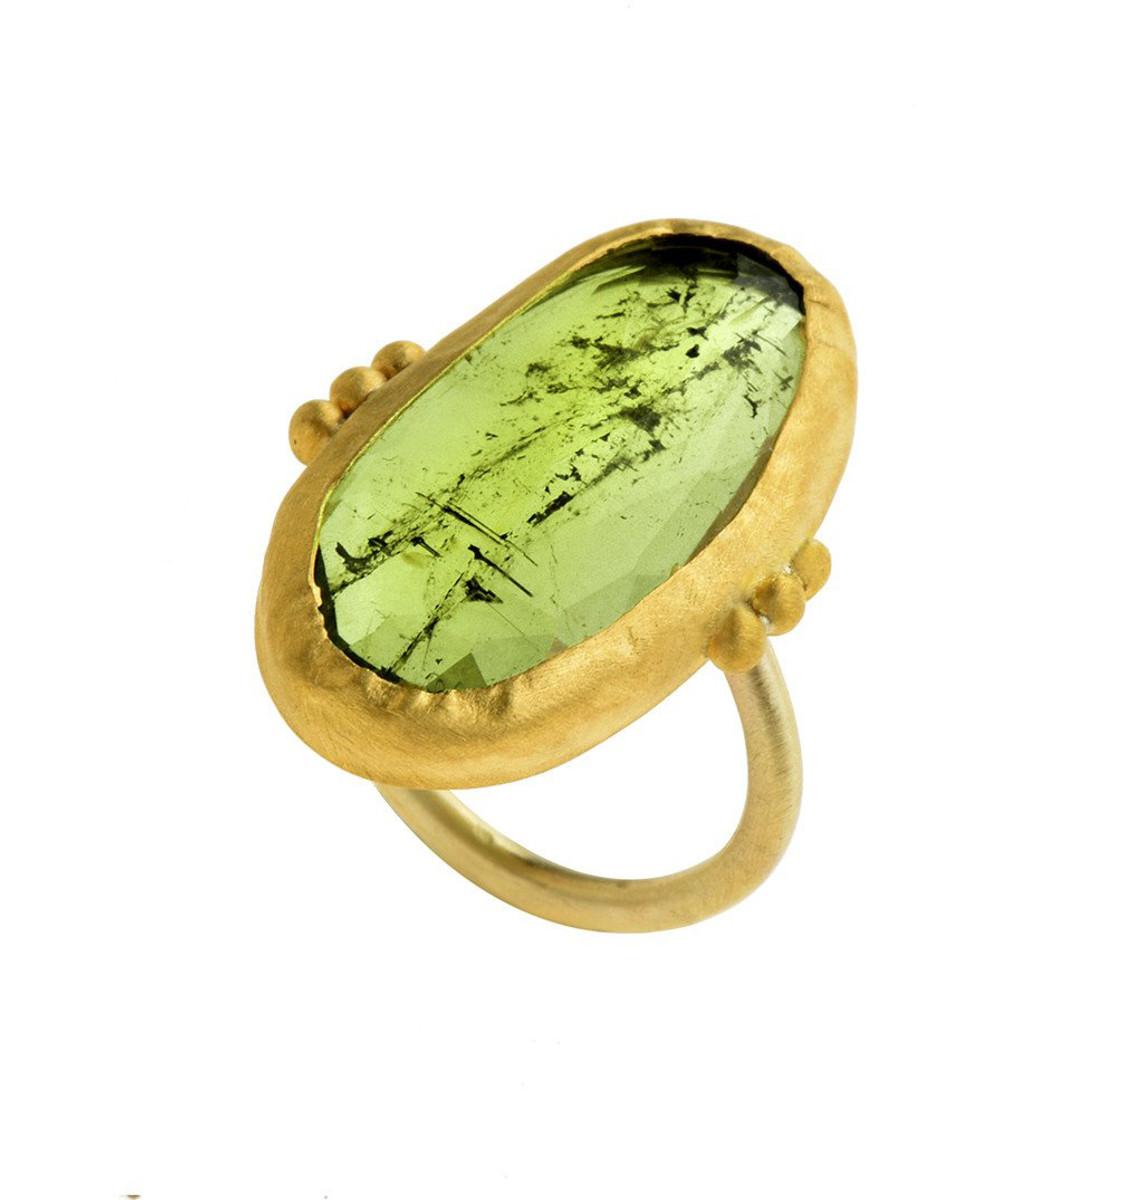 Great Green Tourmaline Ring by Nava Zahavi  - New Arrival